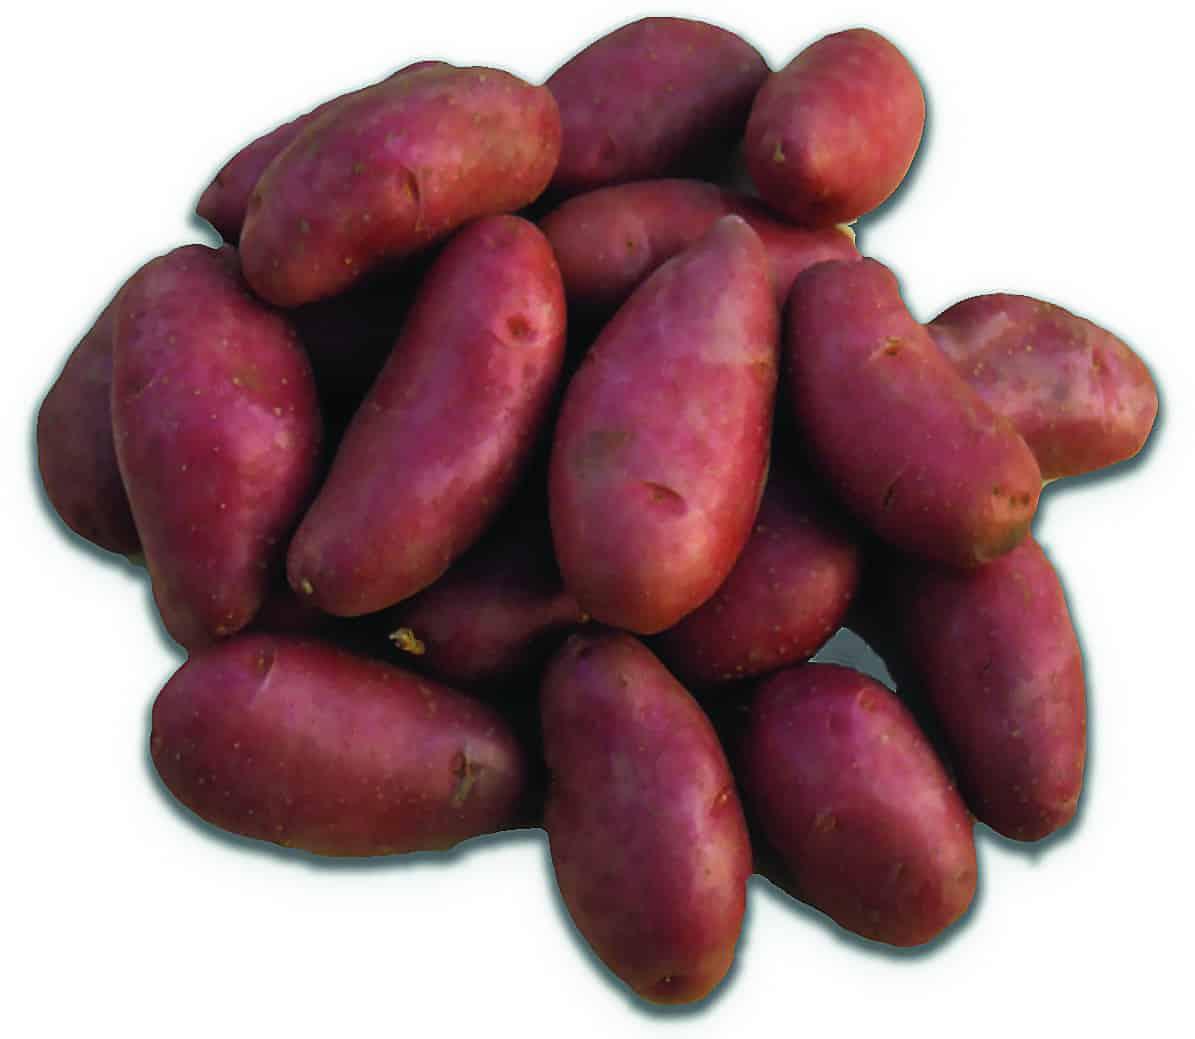 glucolis blue potato sugar testing